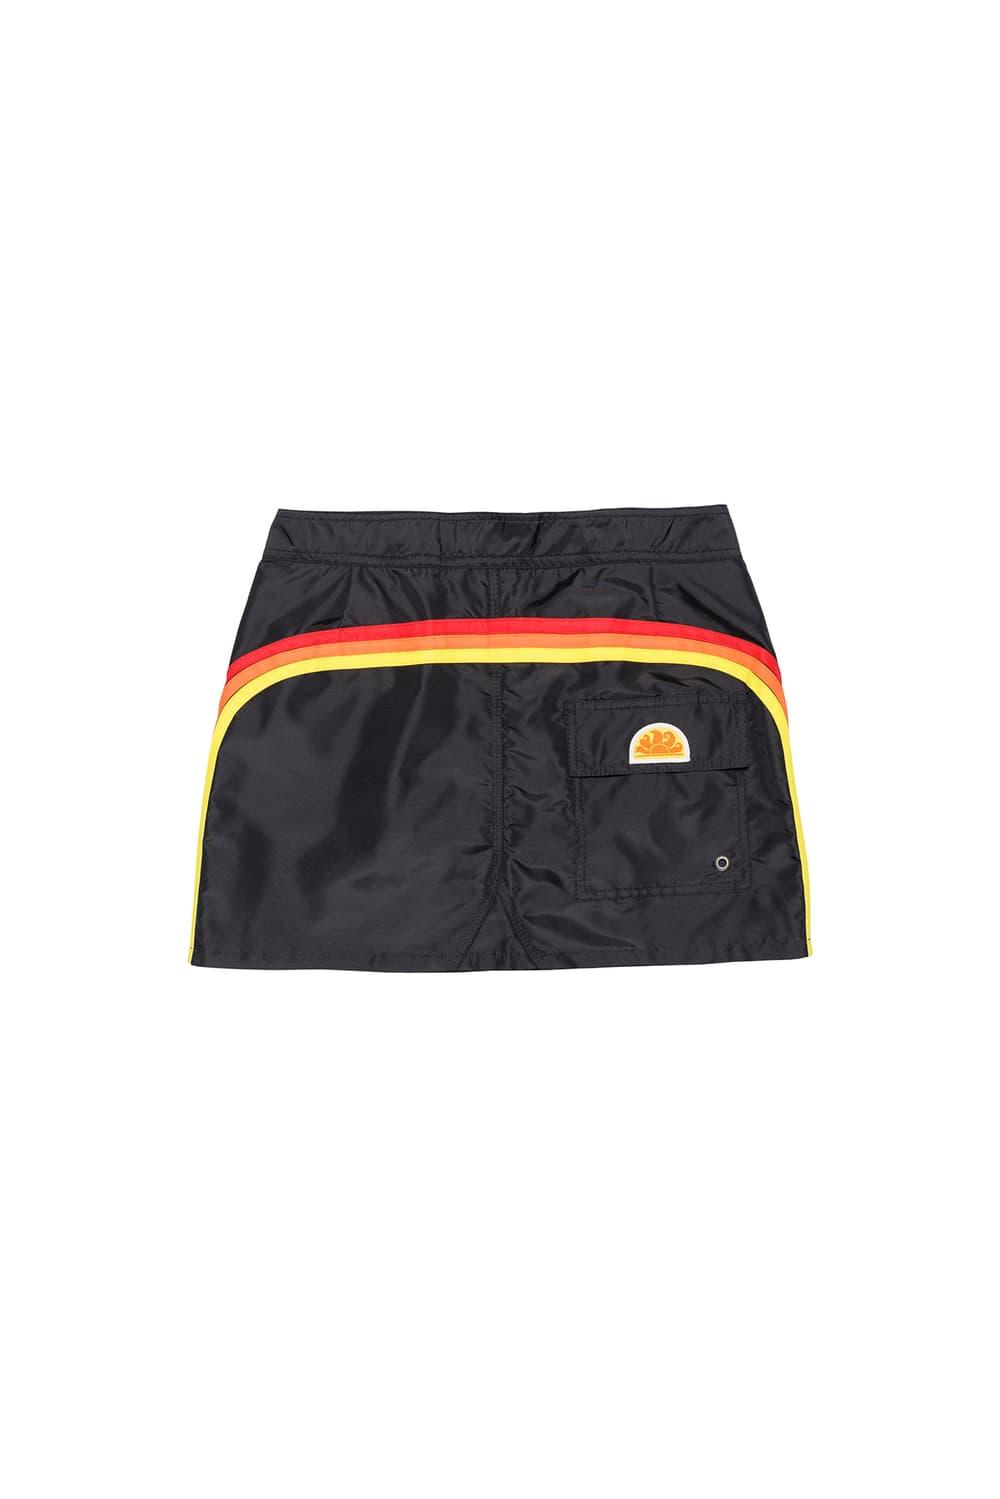 Palm Angels Sun dek spring summer 2018 board shorts pants collaboration LA los angeles swim wear drop release april 2018